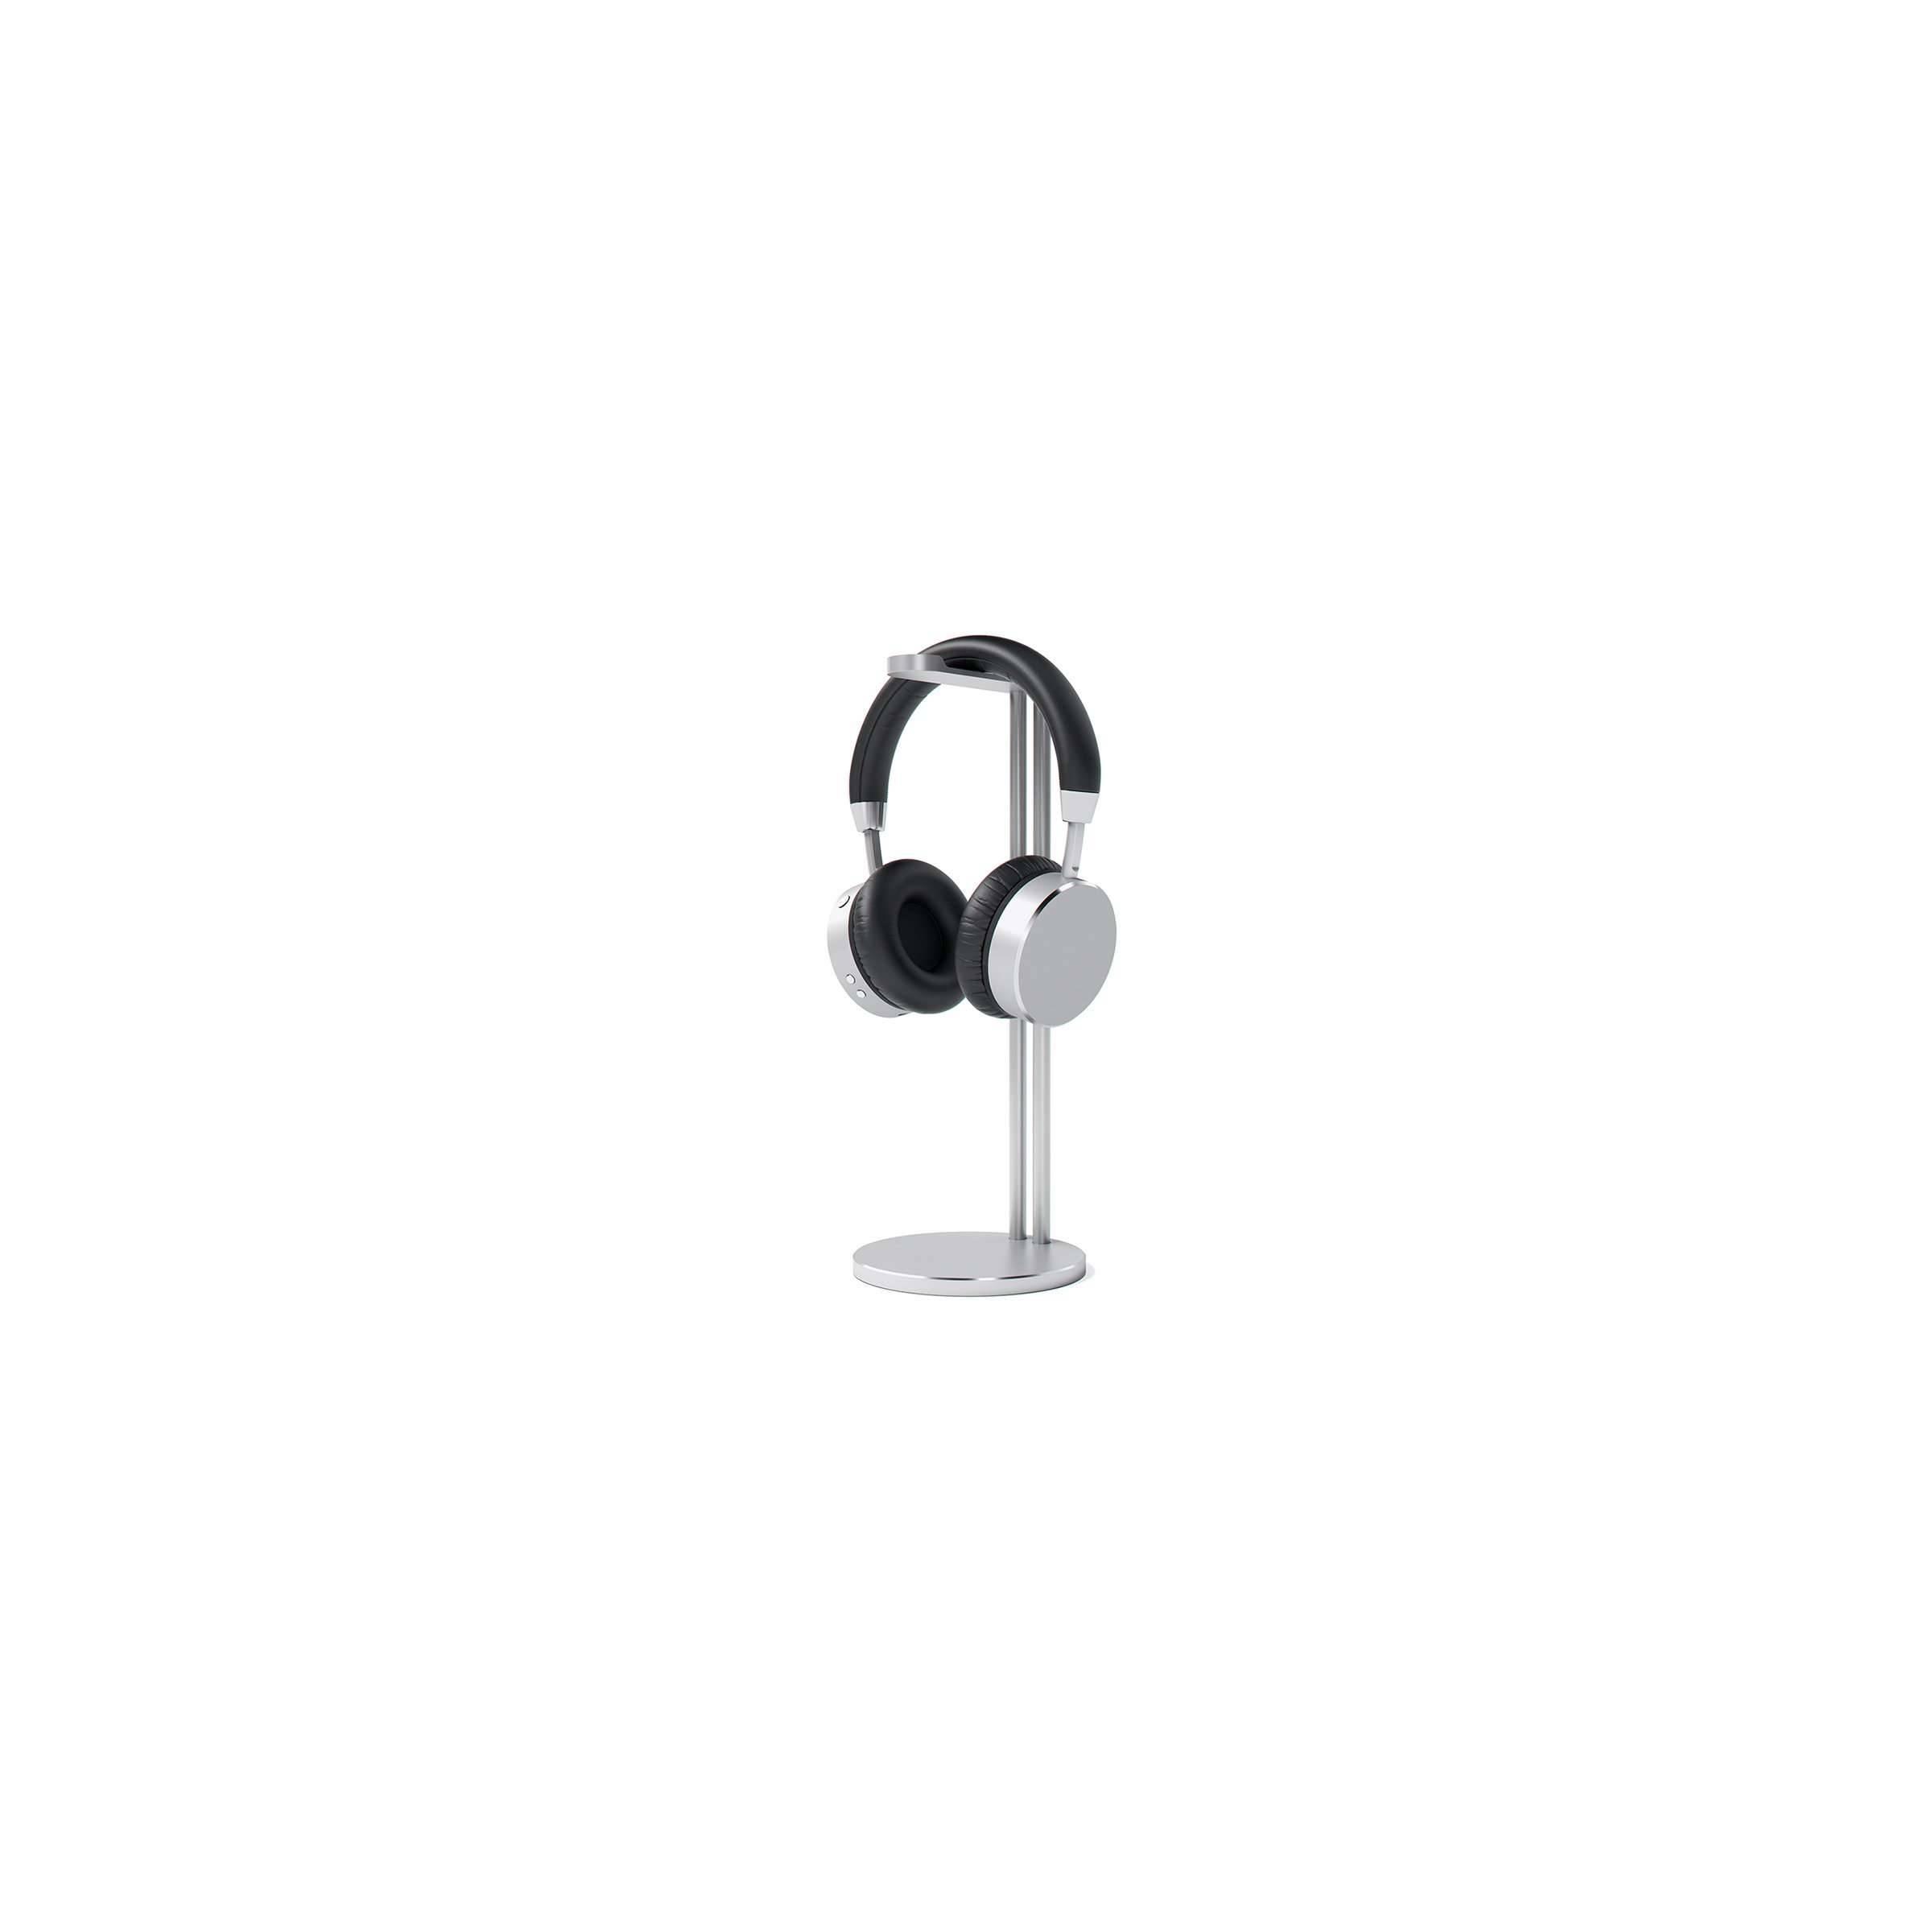 satechi – Satechi slim aluminium høretelefon stander farve sølv farve fra mackabler.dk